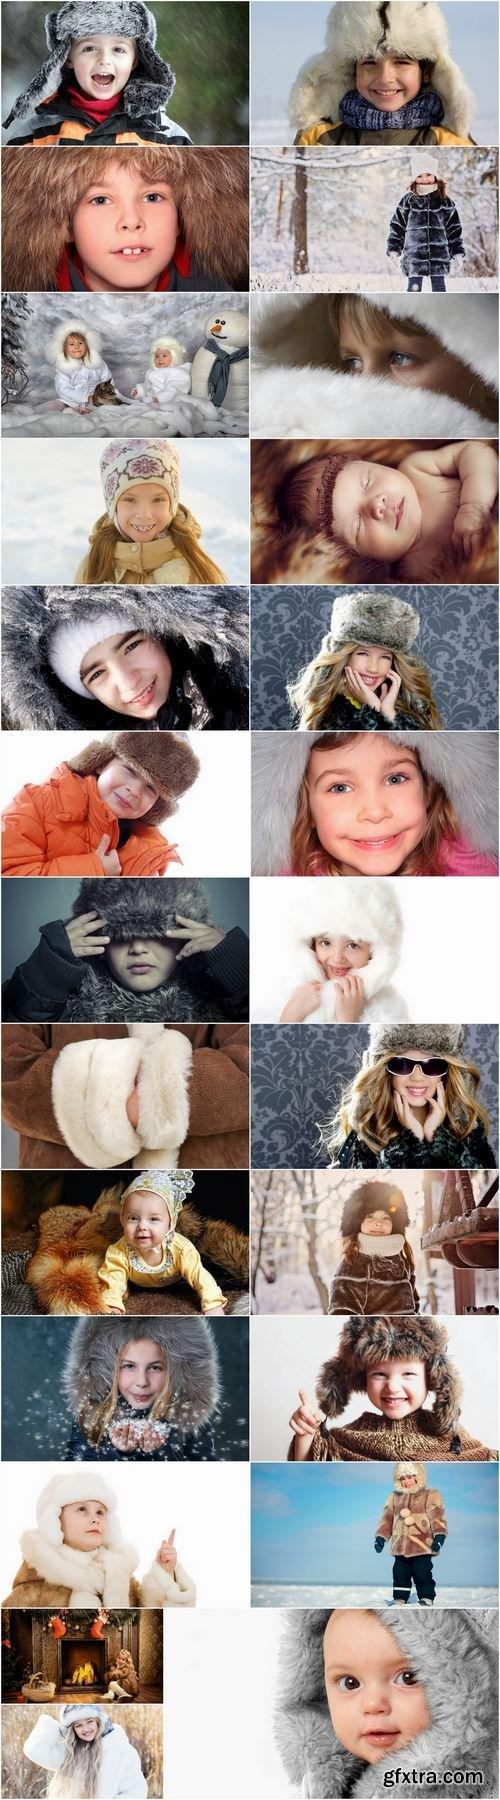 Teenage children child in warm clothes cap coat jacket 25 HQ Jpeg